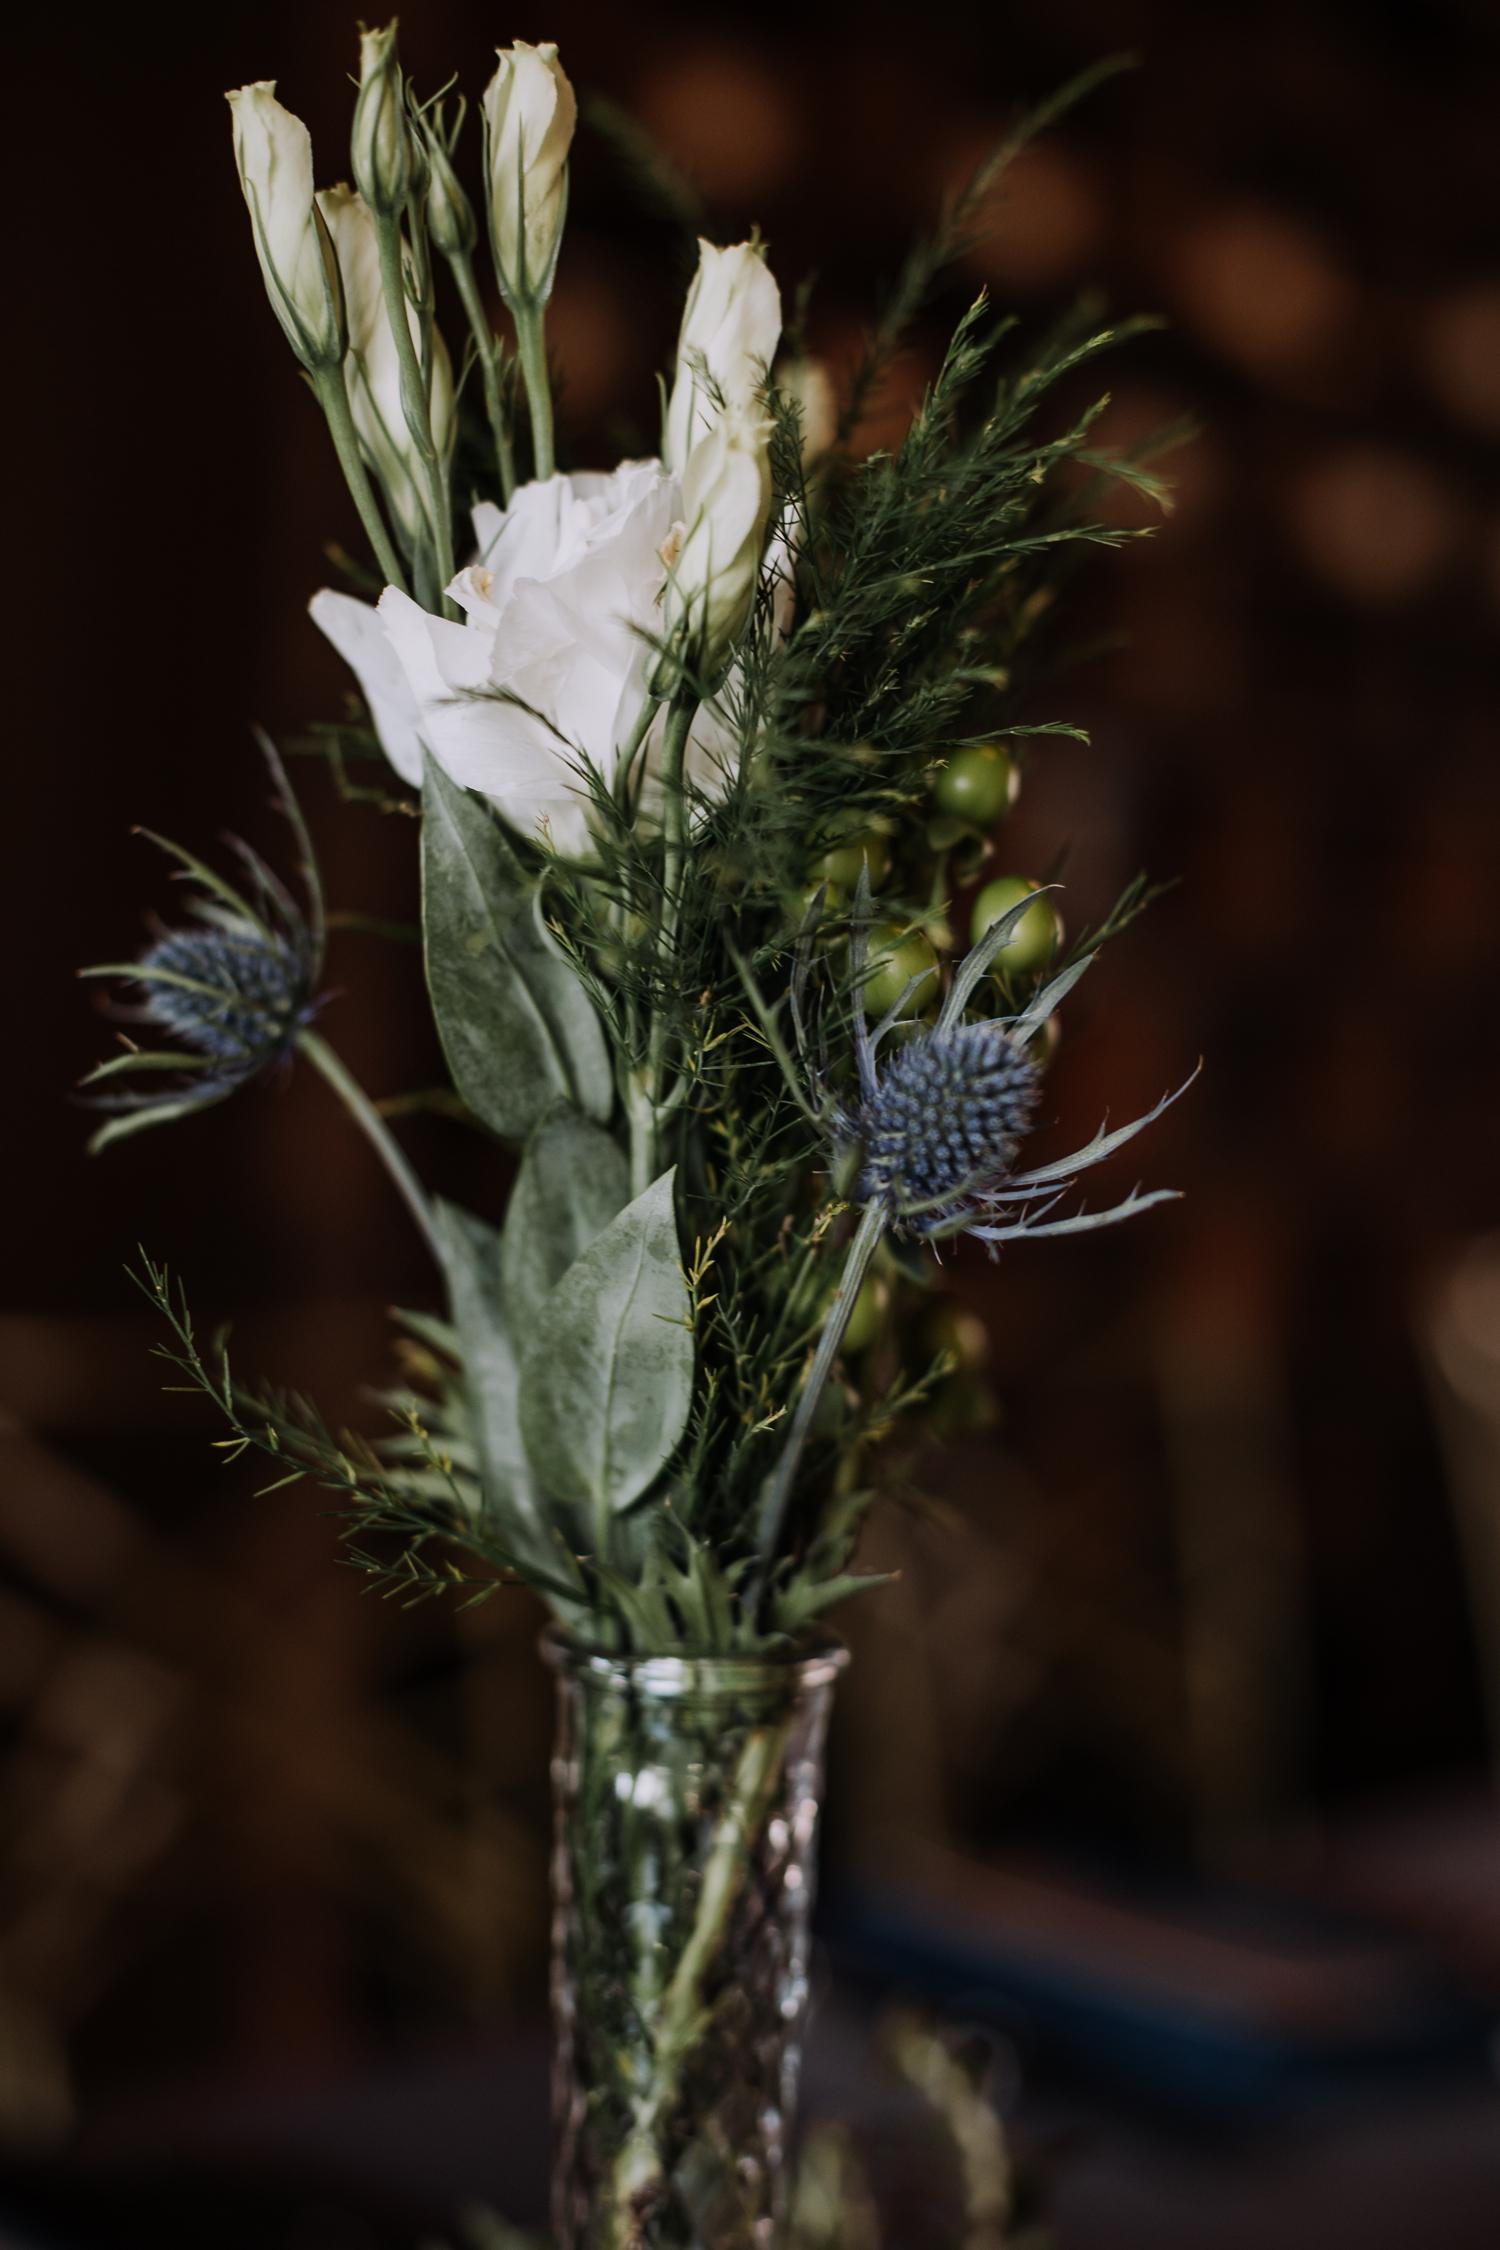 Wedding Centerpieces - Classic Indianapolis Wedding - Canal 337 Wedding - The Overwhelmed Bride Wedding Blog